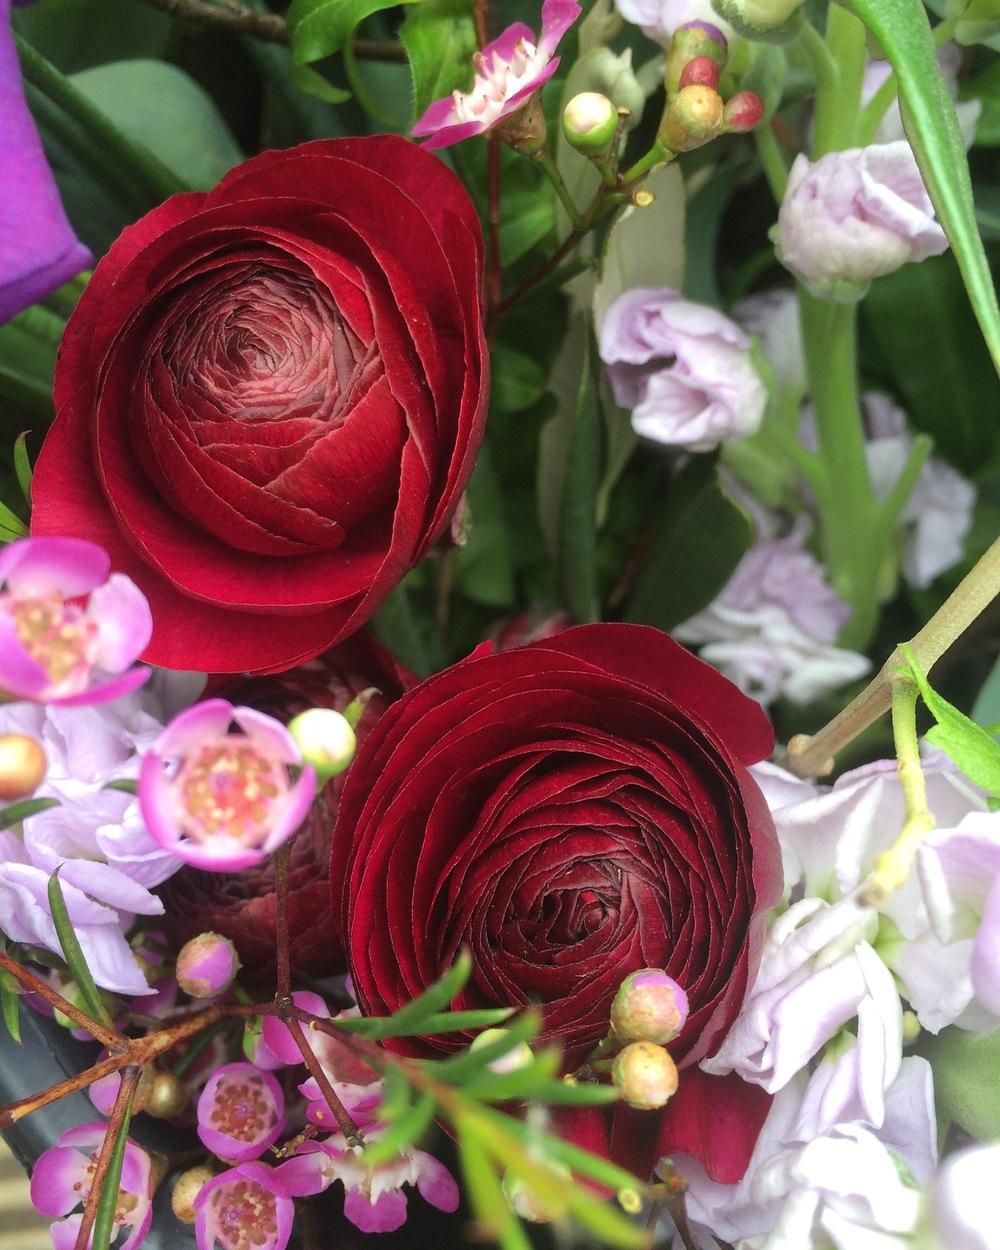 Ranunculus and wax flower